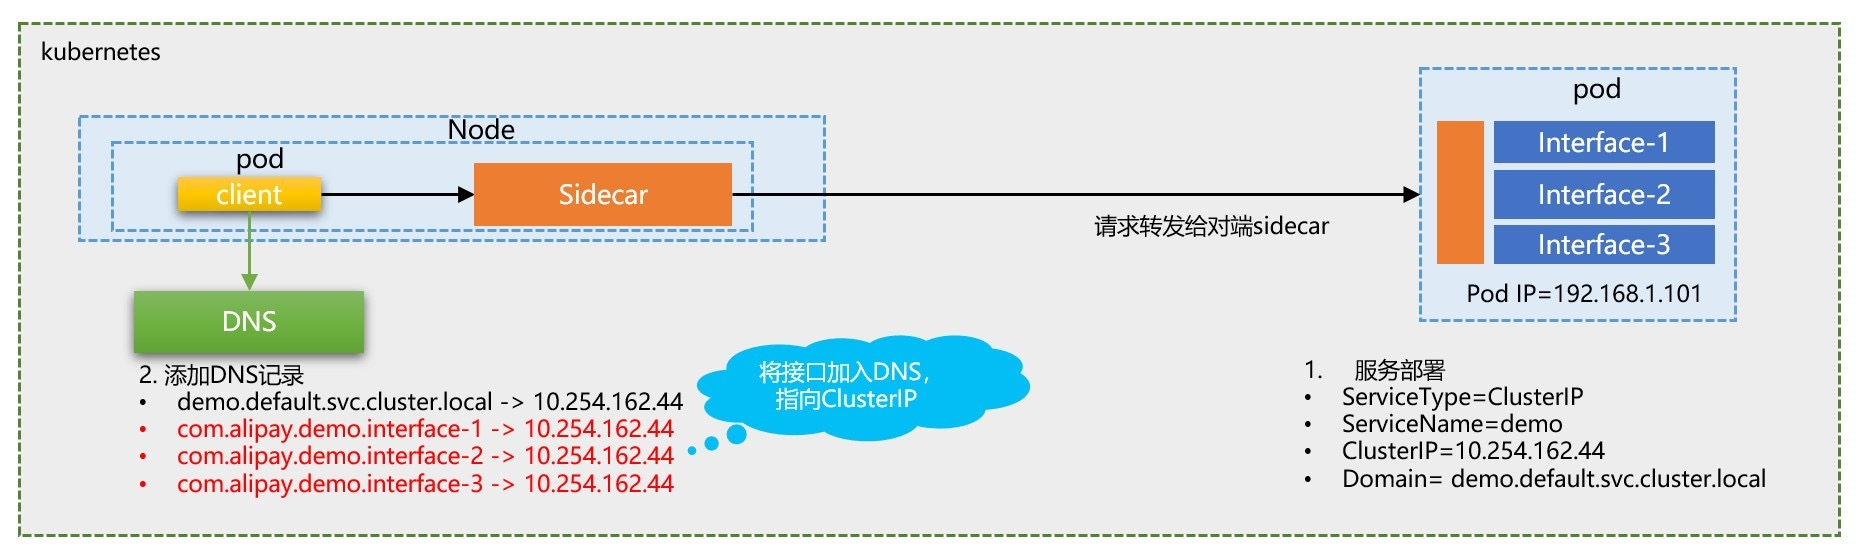 Sidecar注册DNS名称